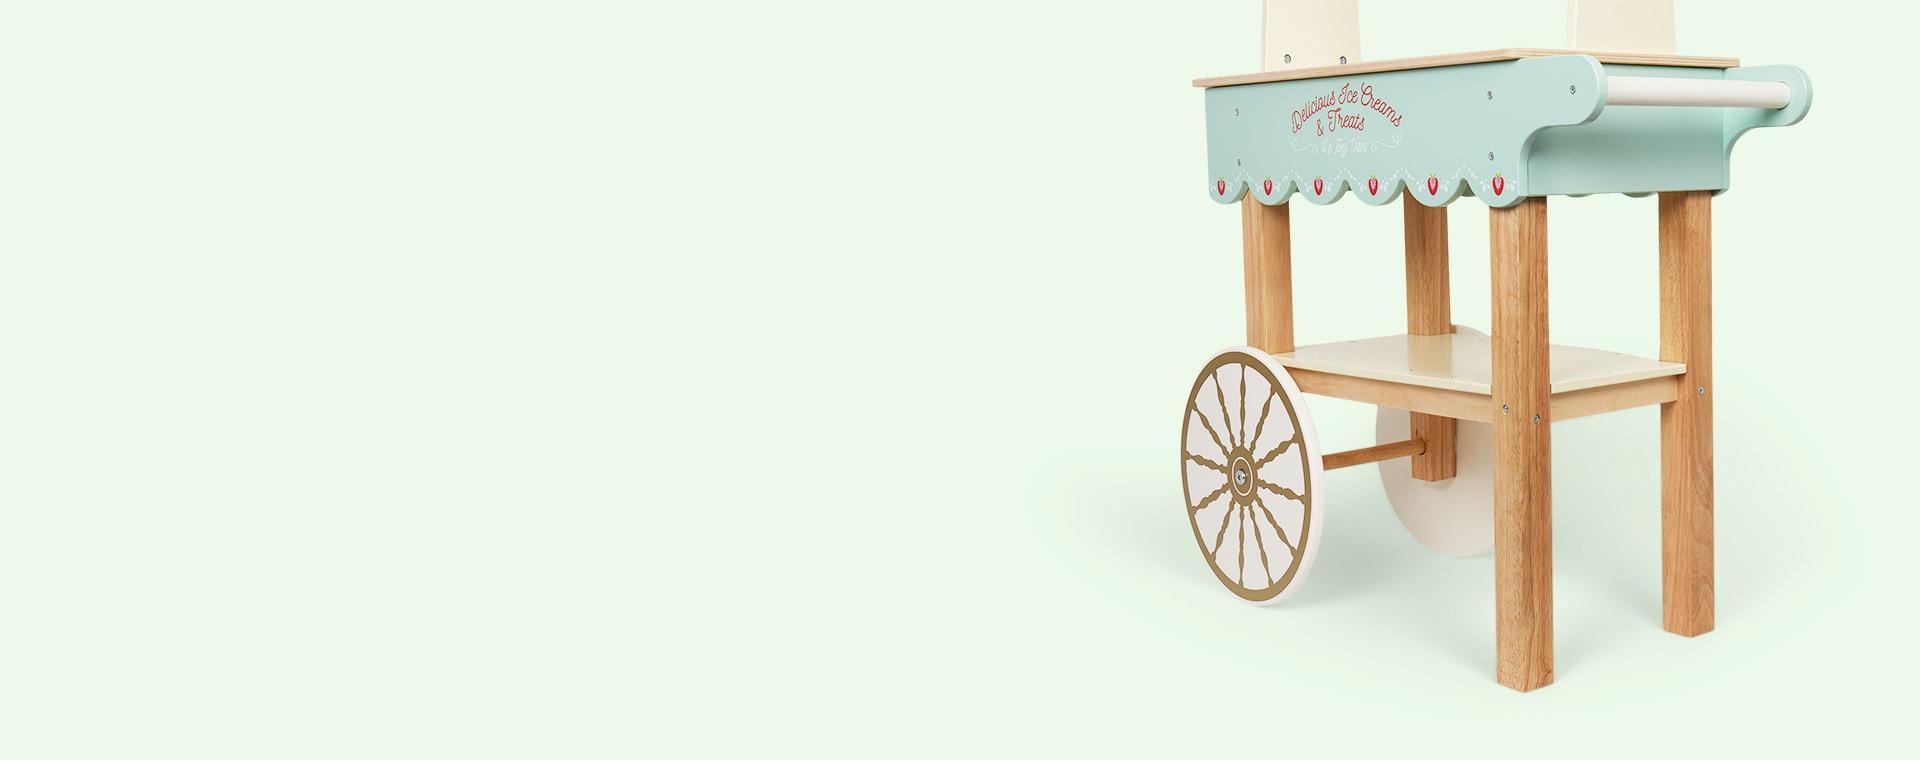 Blue Le Toy Van Ice Cream & Treats Trolley